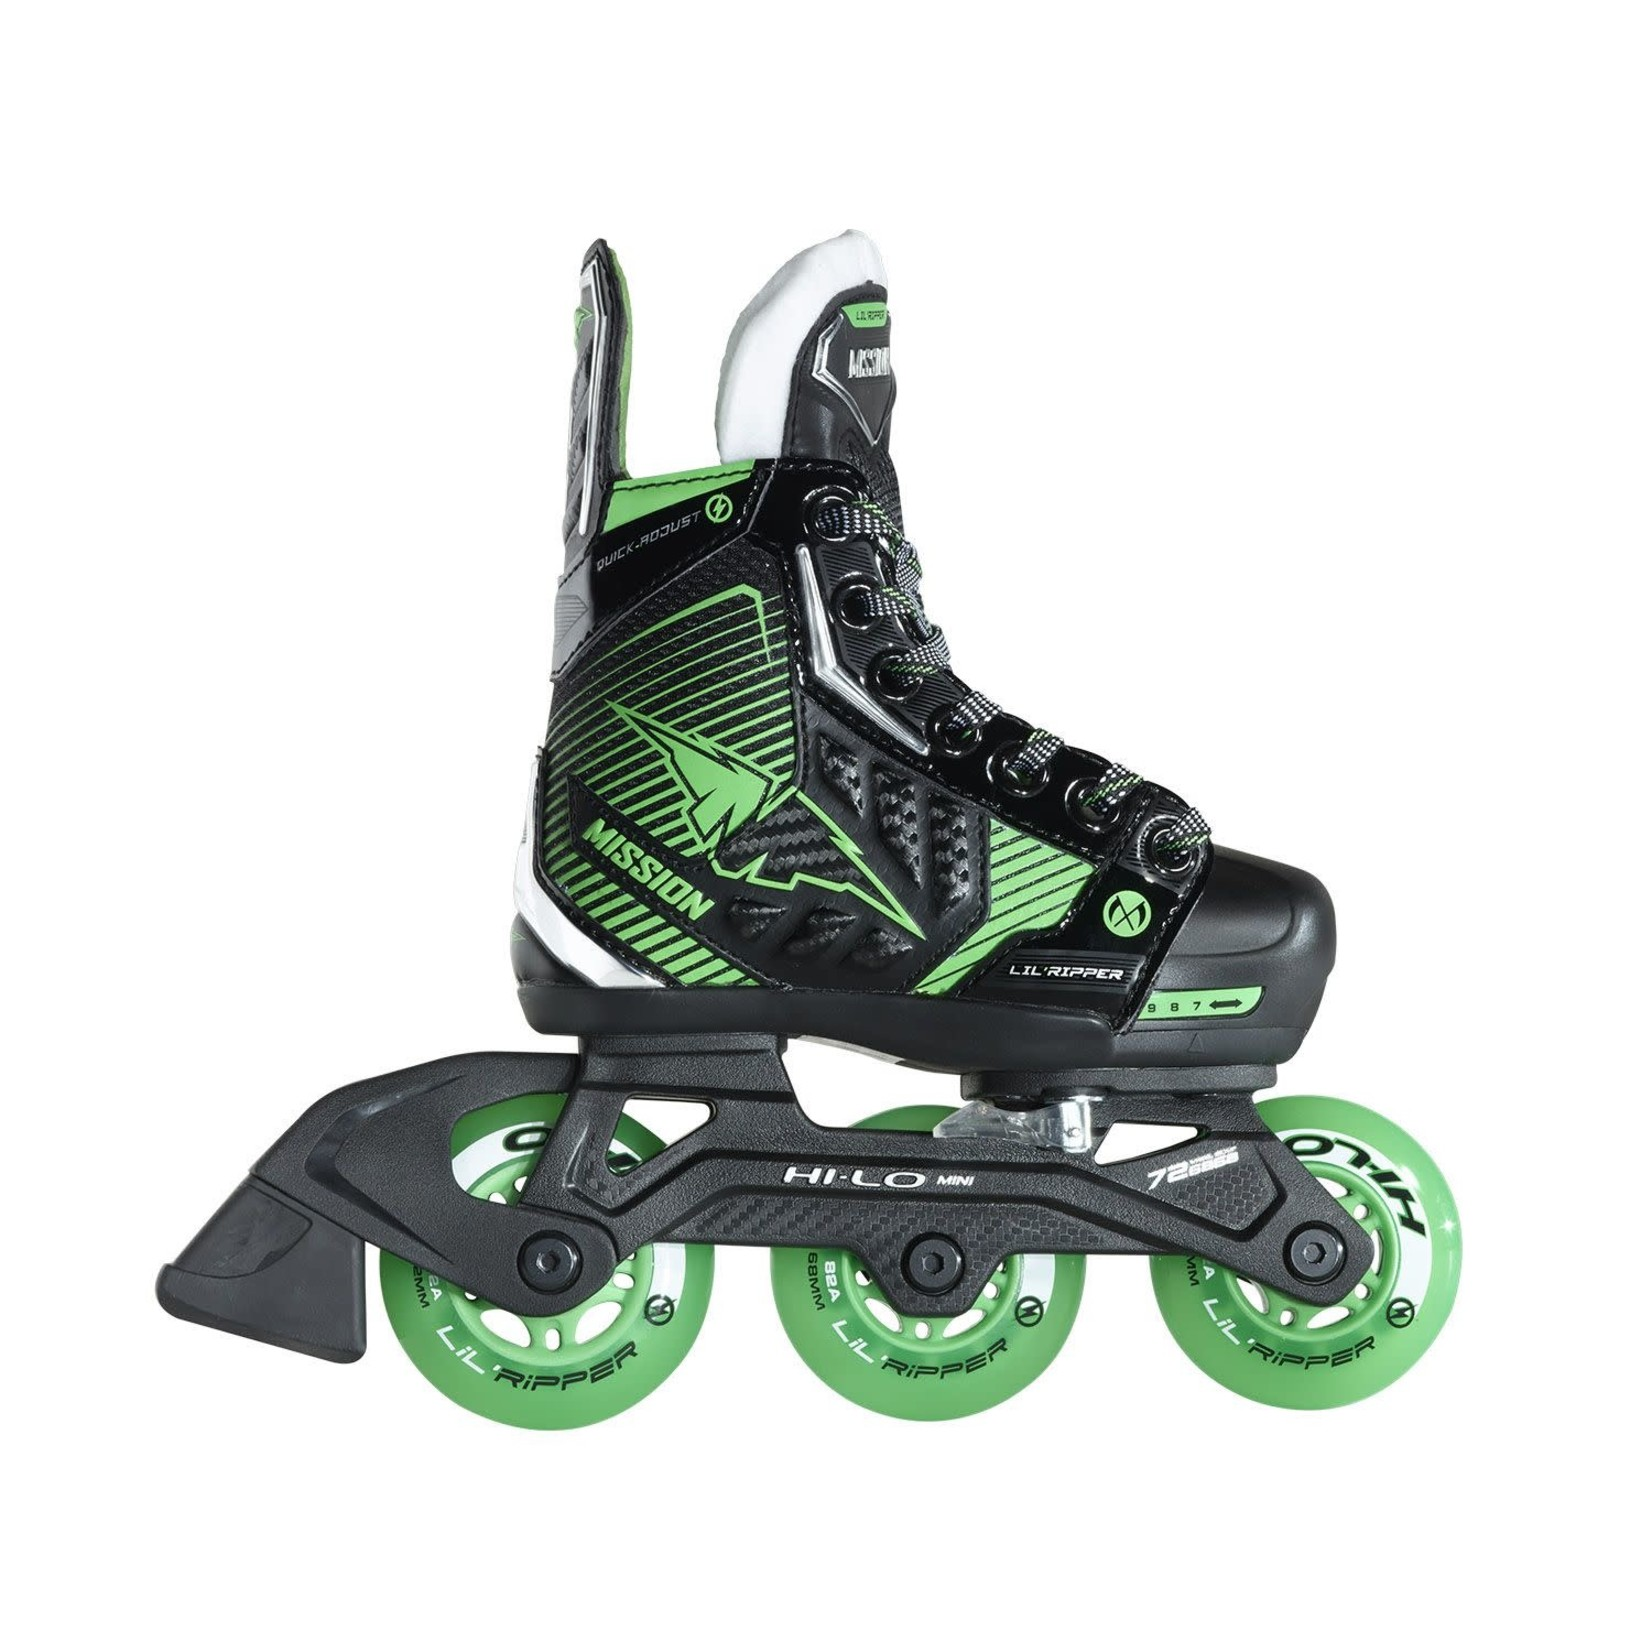 Mission Roller Hockey Skates, RH Lil' Ripper Adjustable, Youth